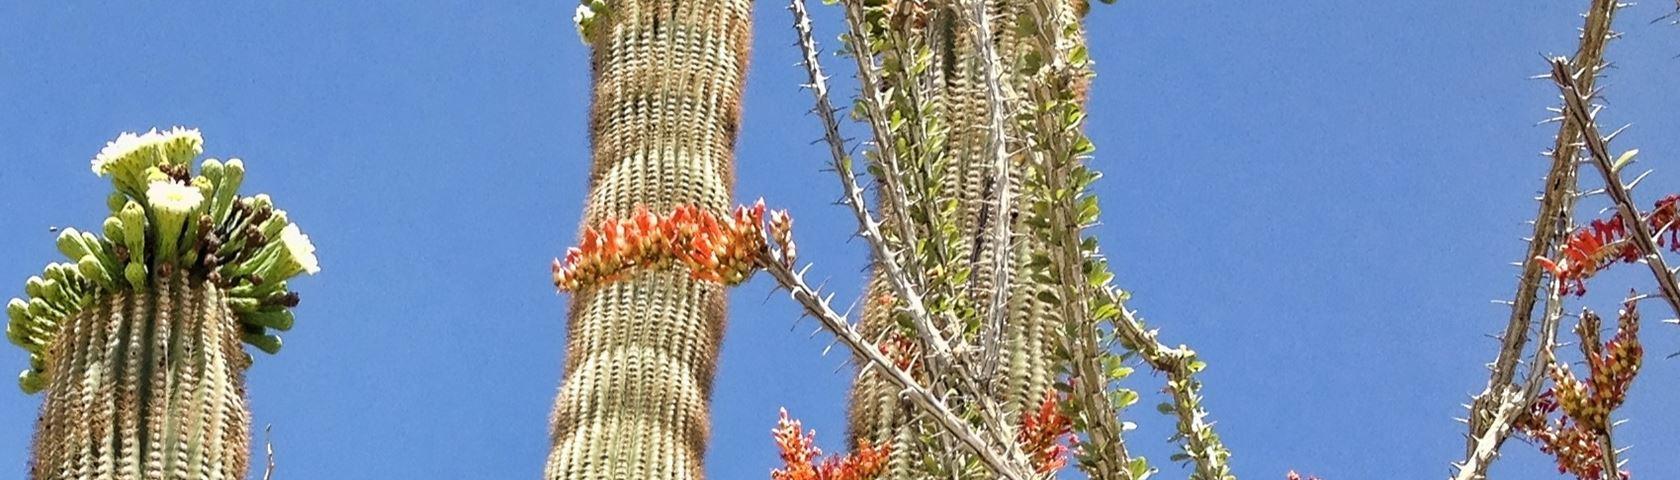 Cactus Skeleton